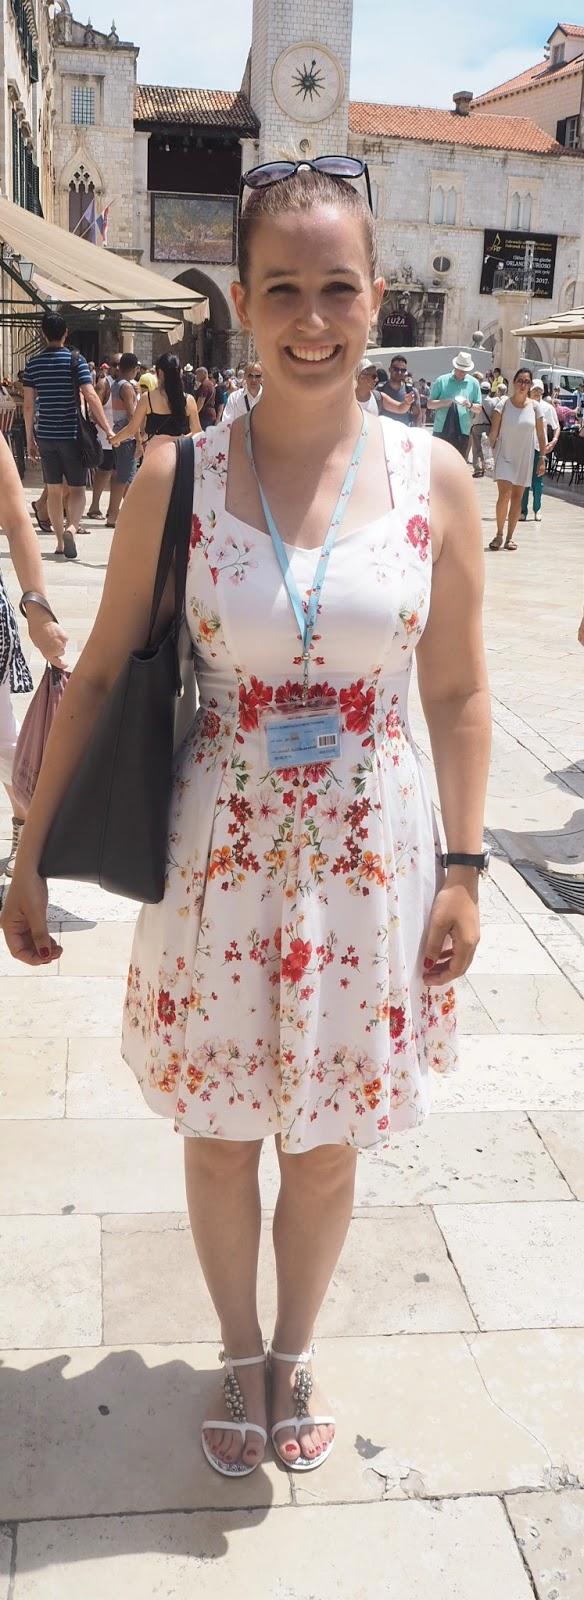 Dubrovnik travel tour guide Ivana Basi